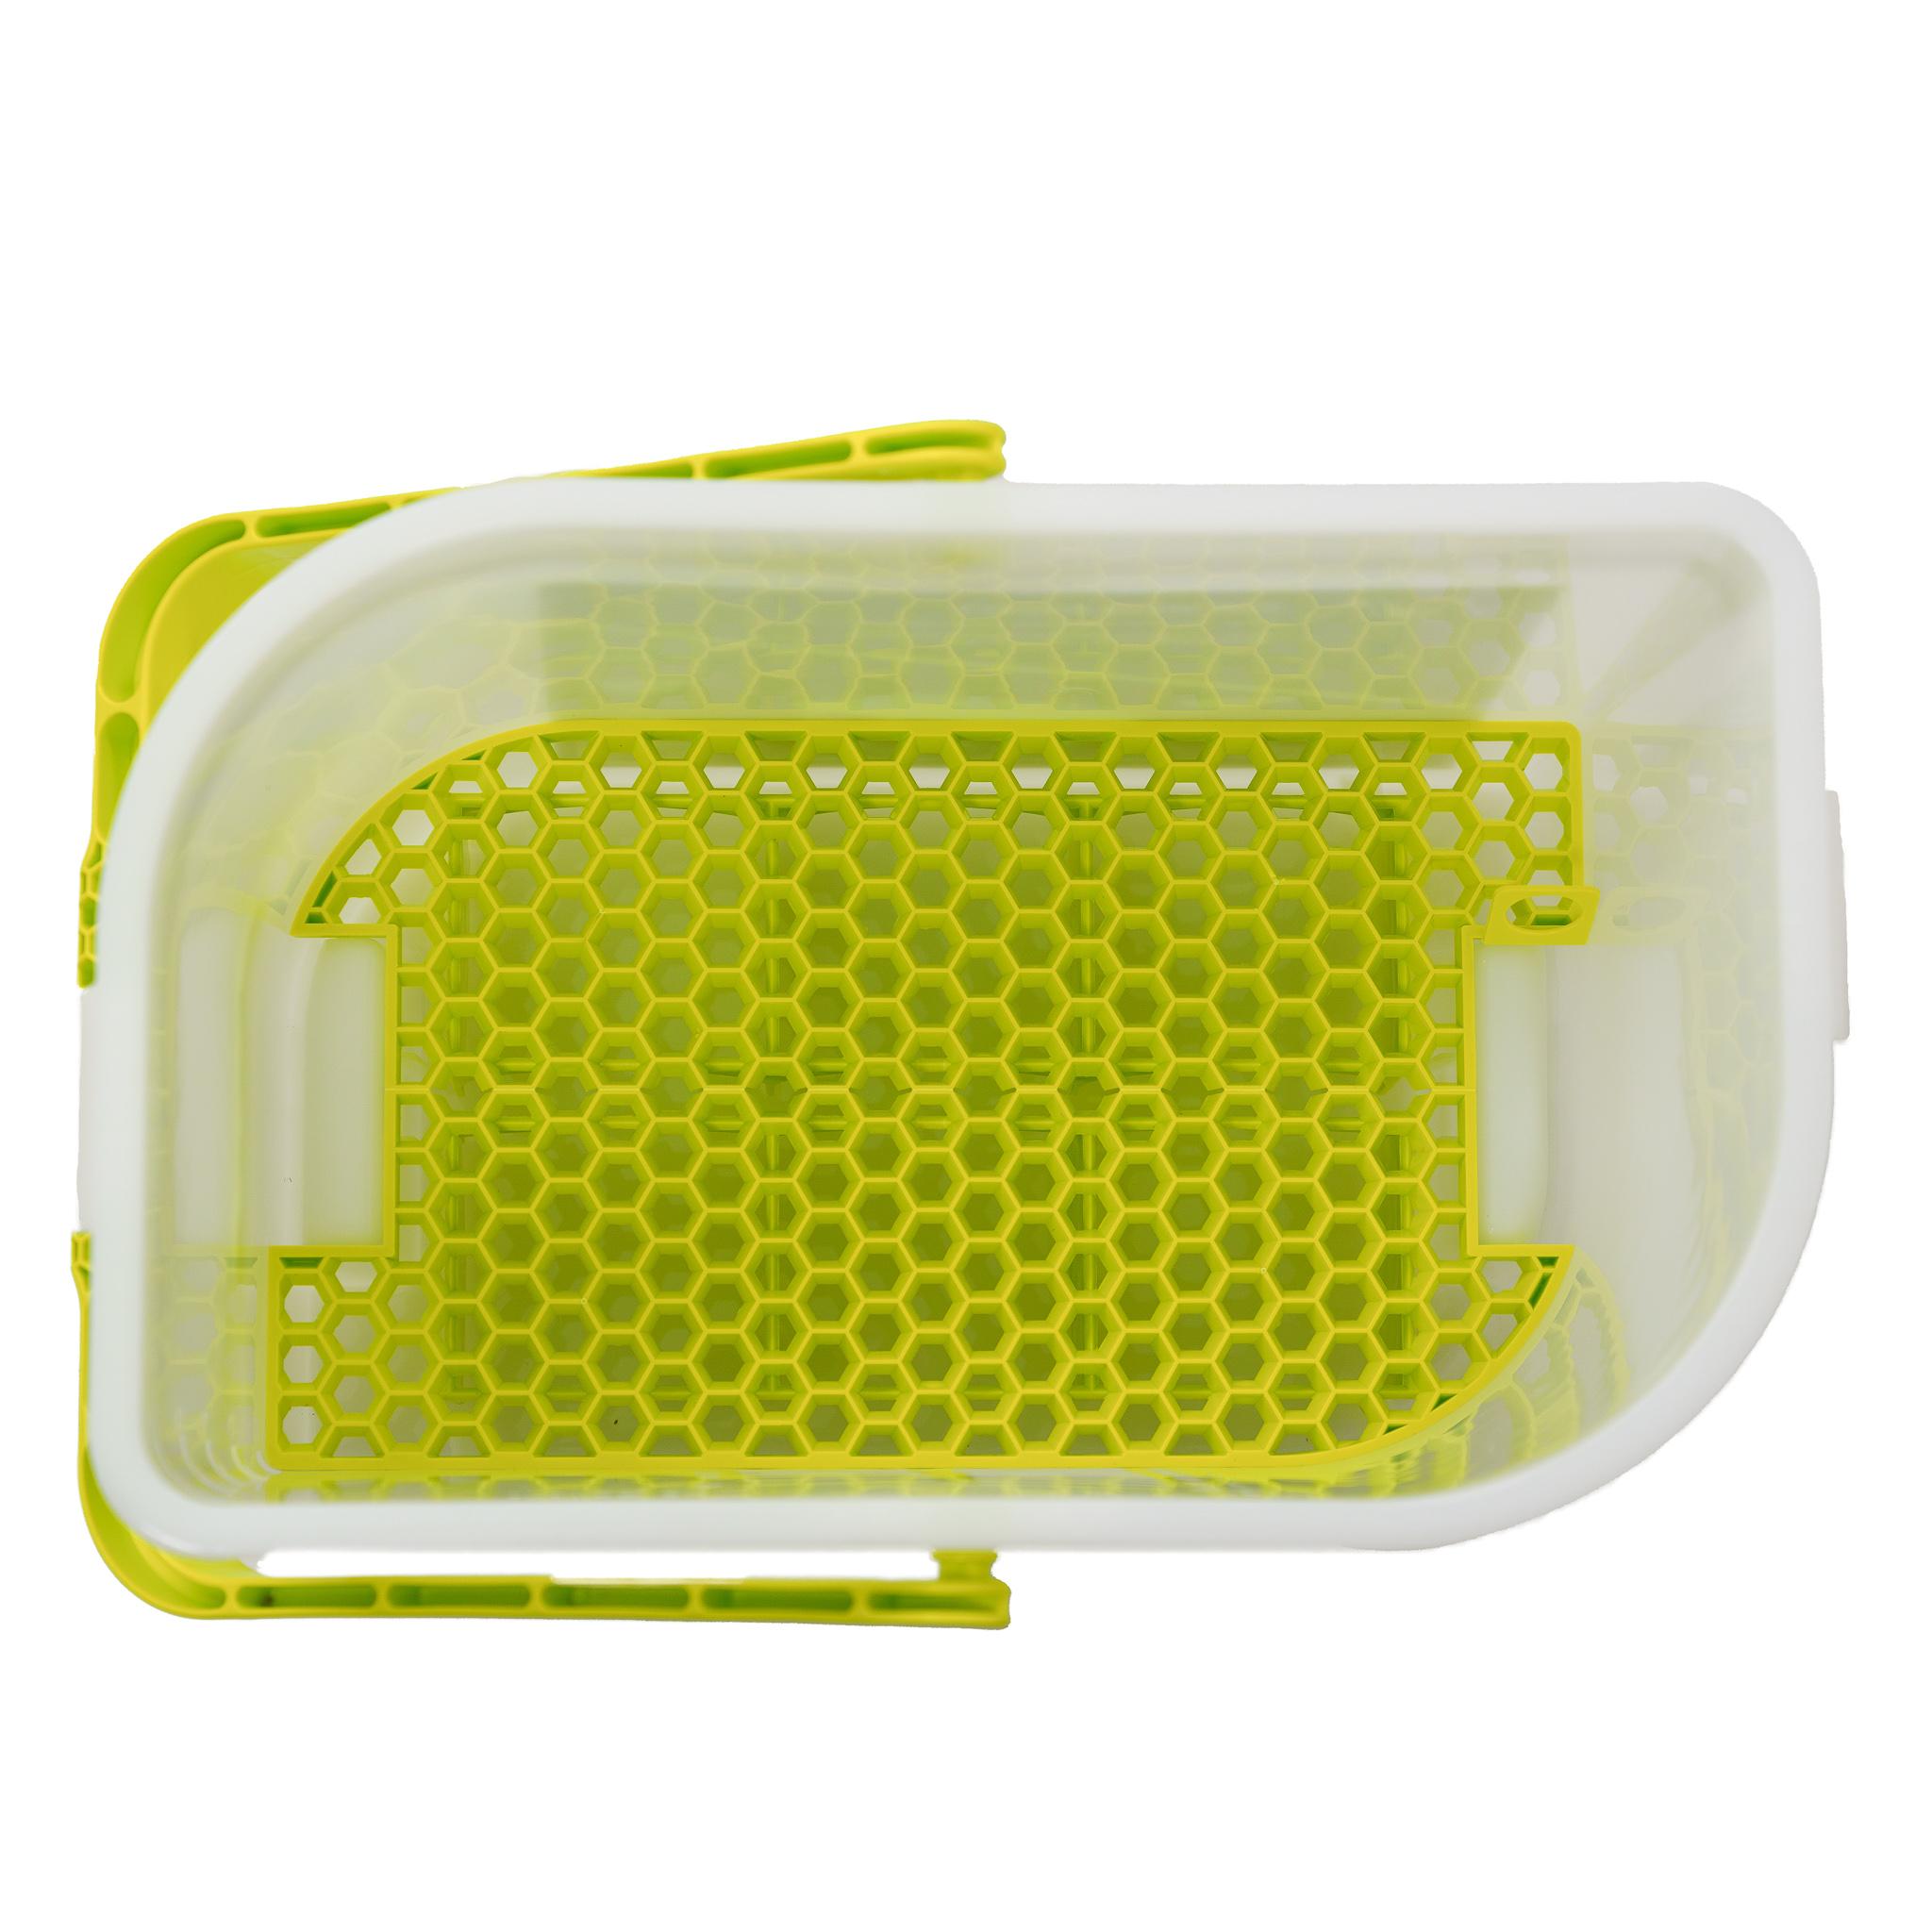 Car Care Bucket transparent 2